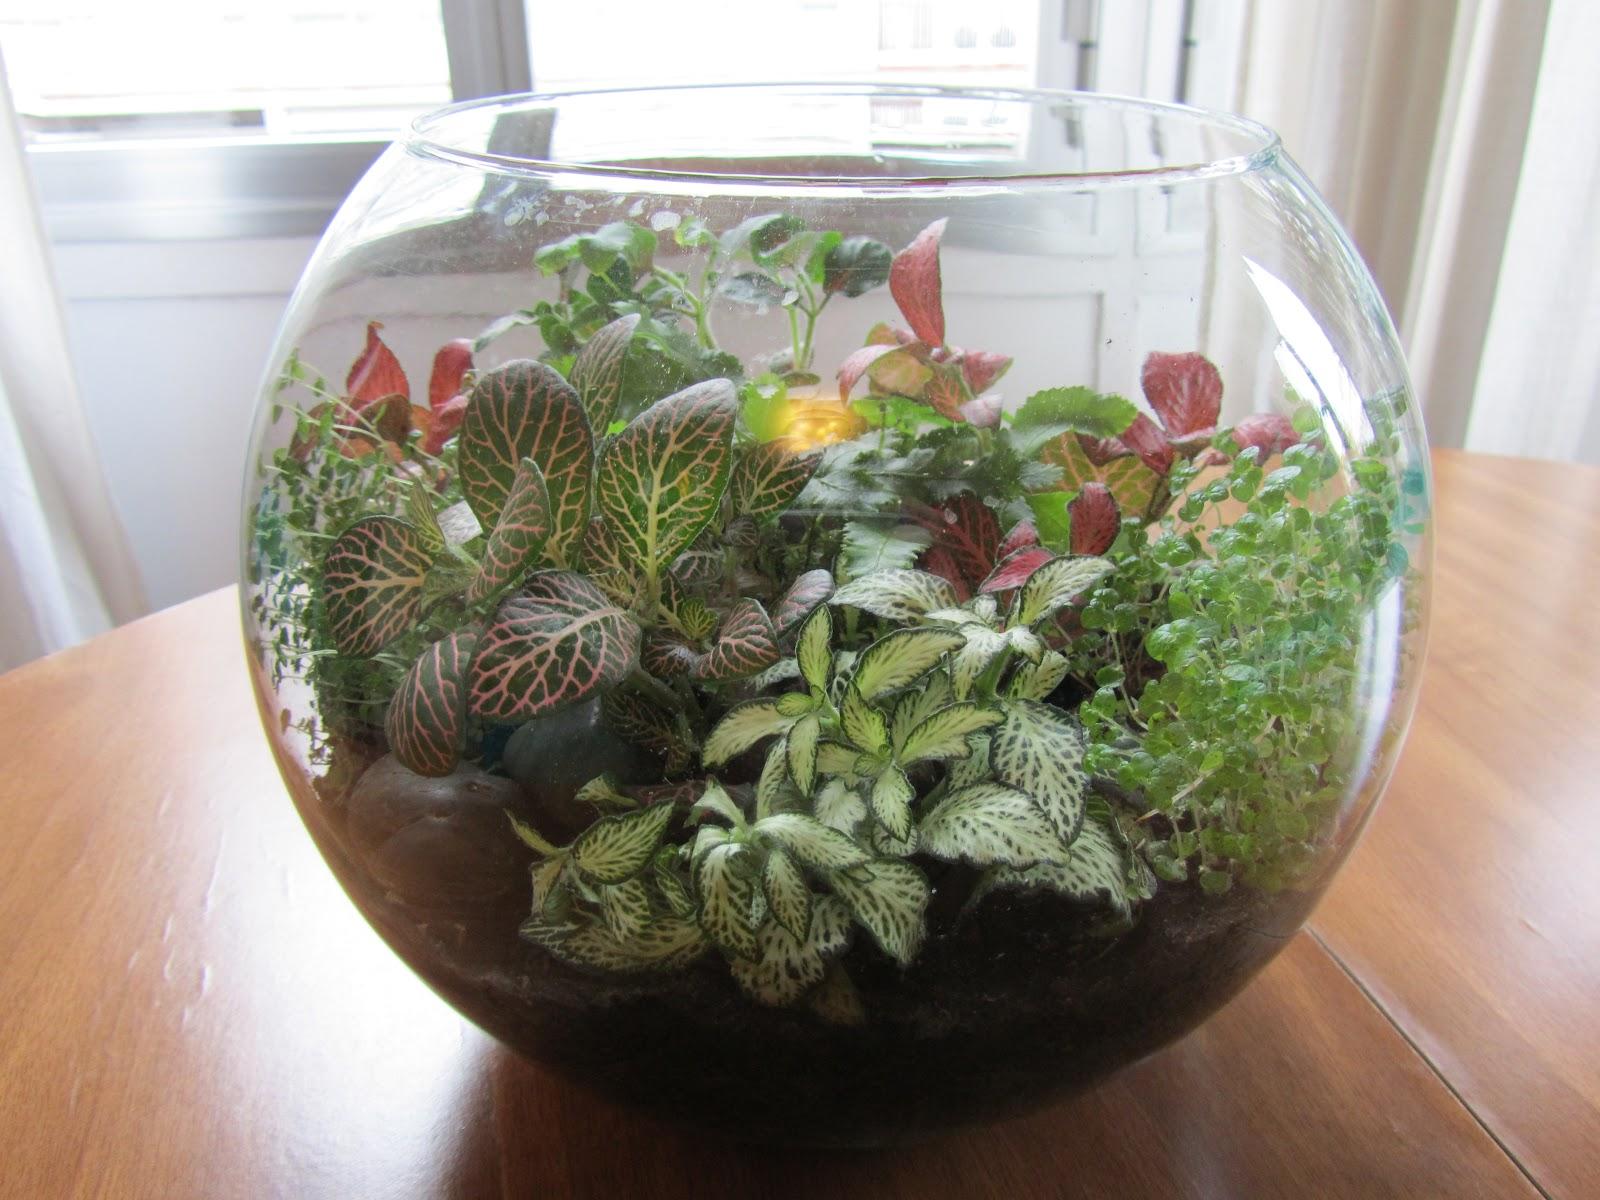 El Reino Plantae Como Hacer Un Terrario Paso A Paso - Terrario-para-plantas